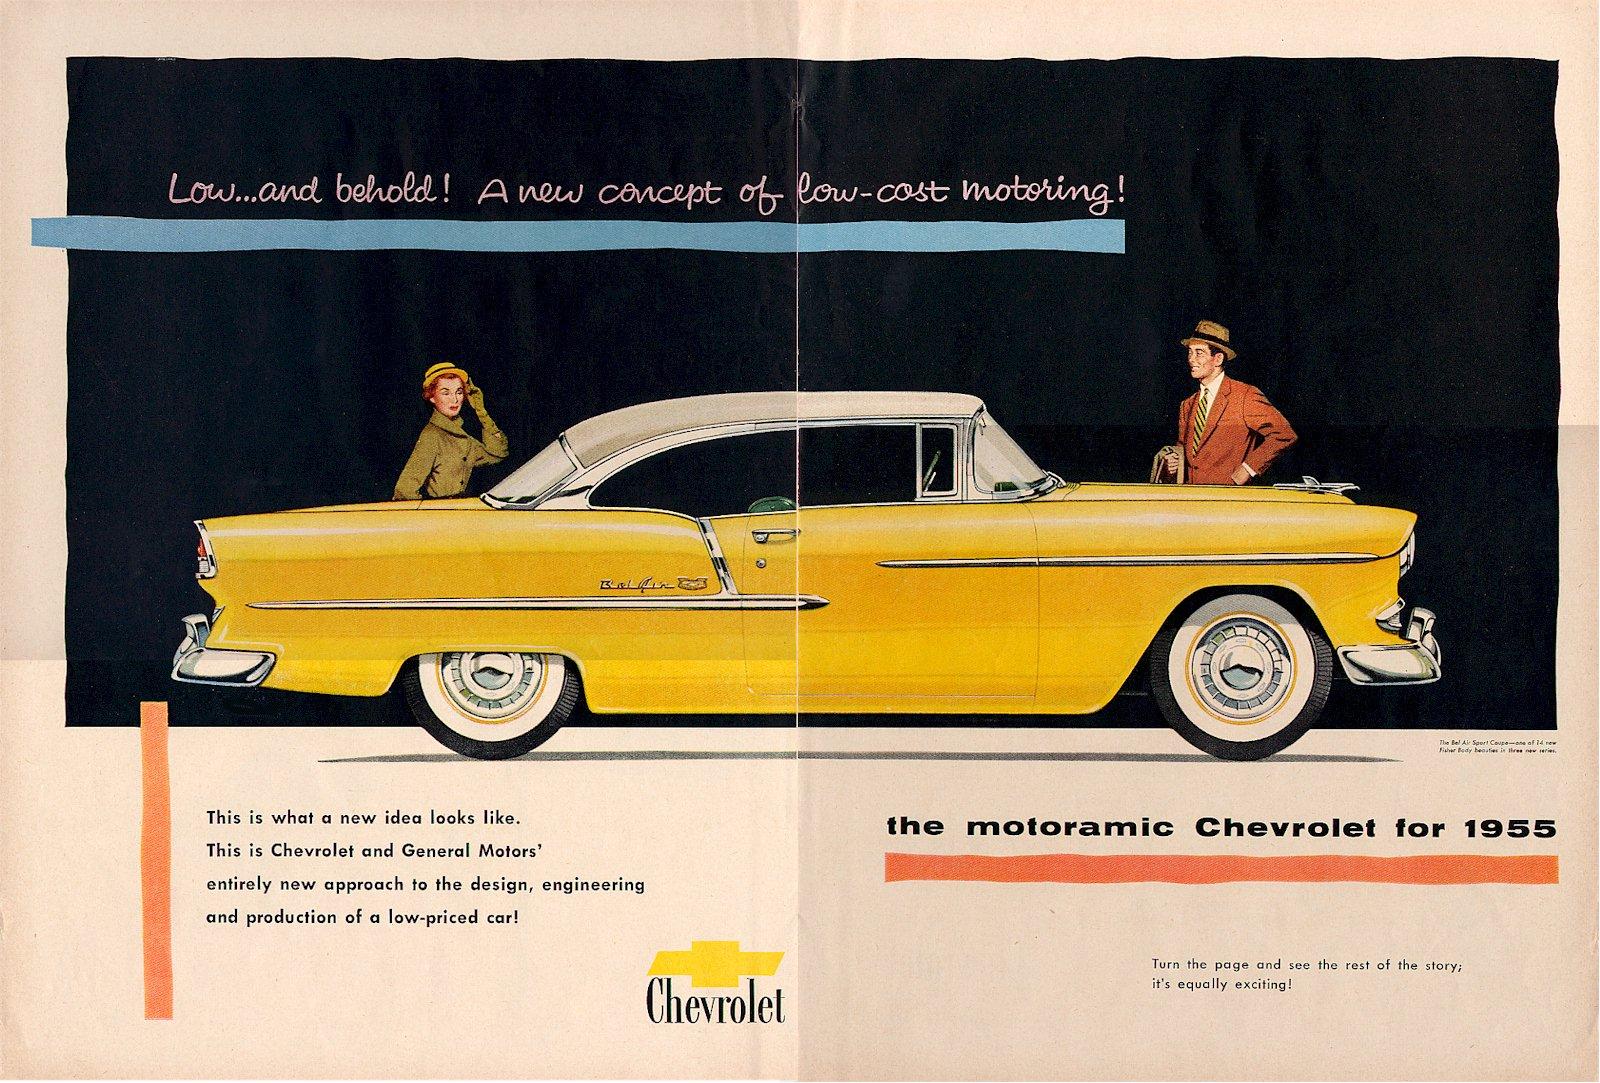 chevrolet advertisement analysis